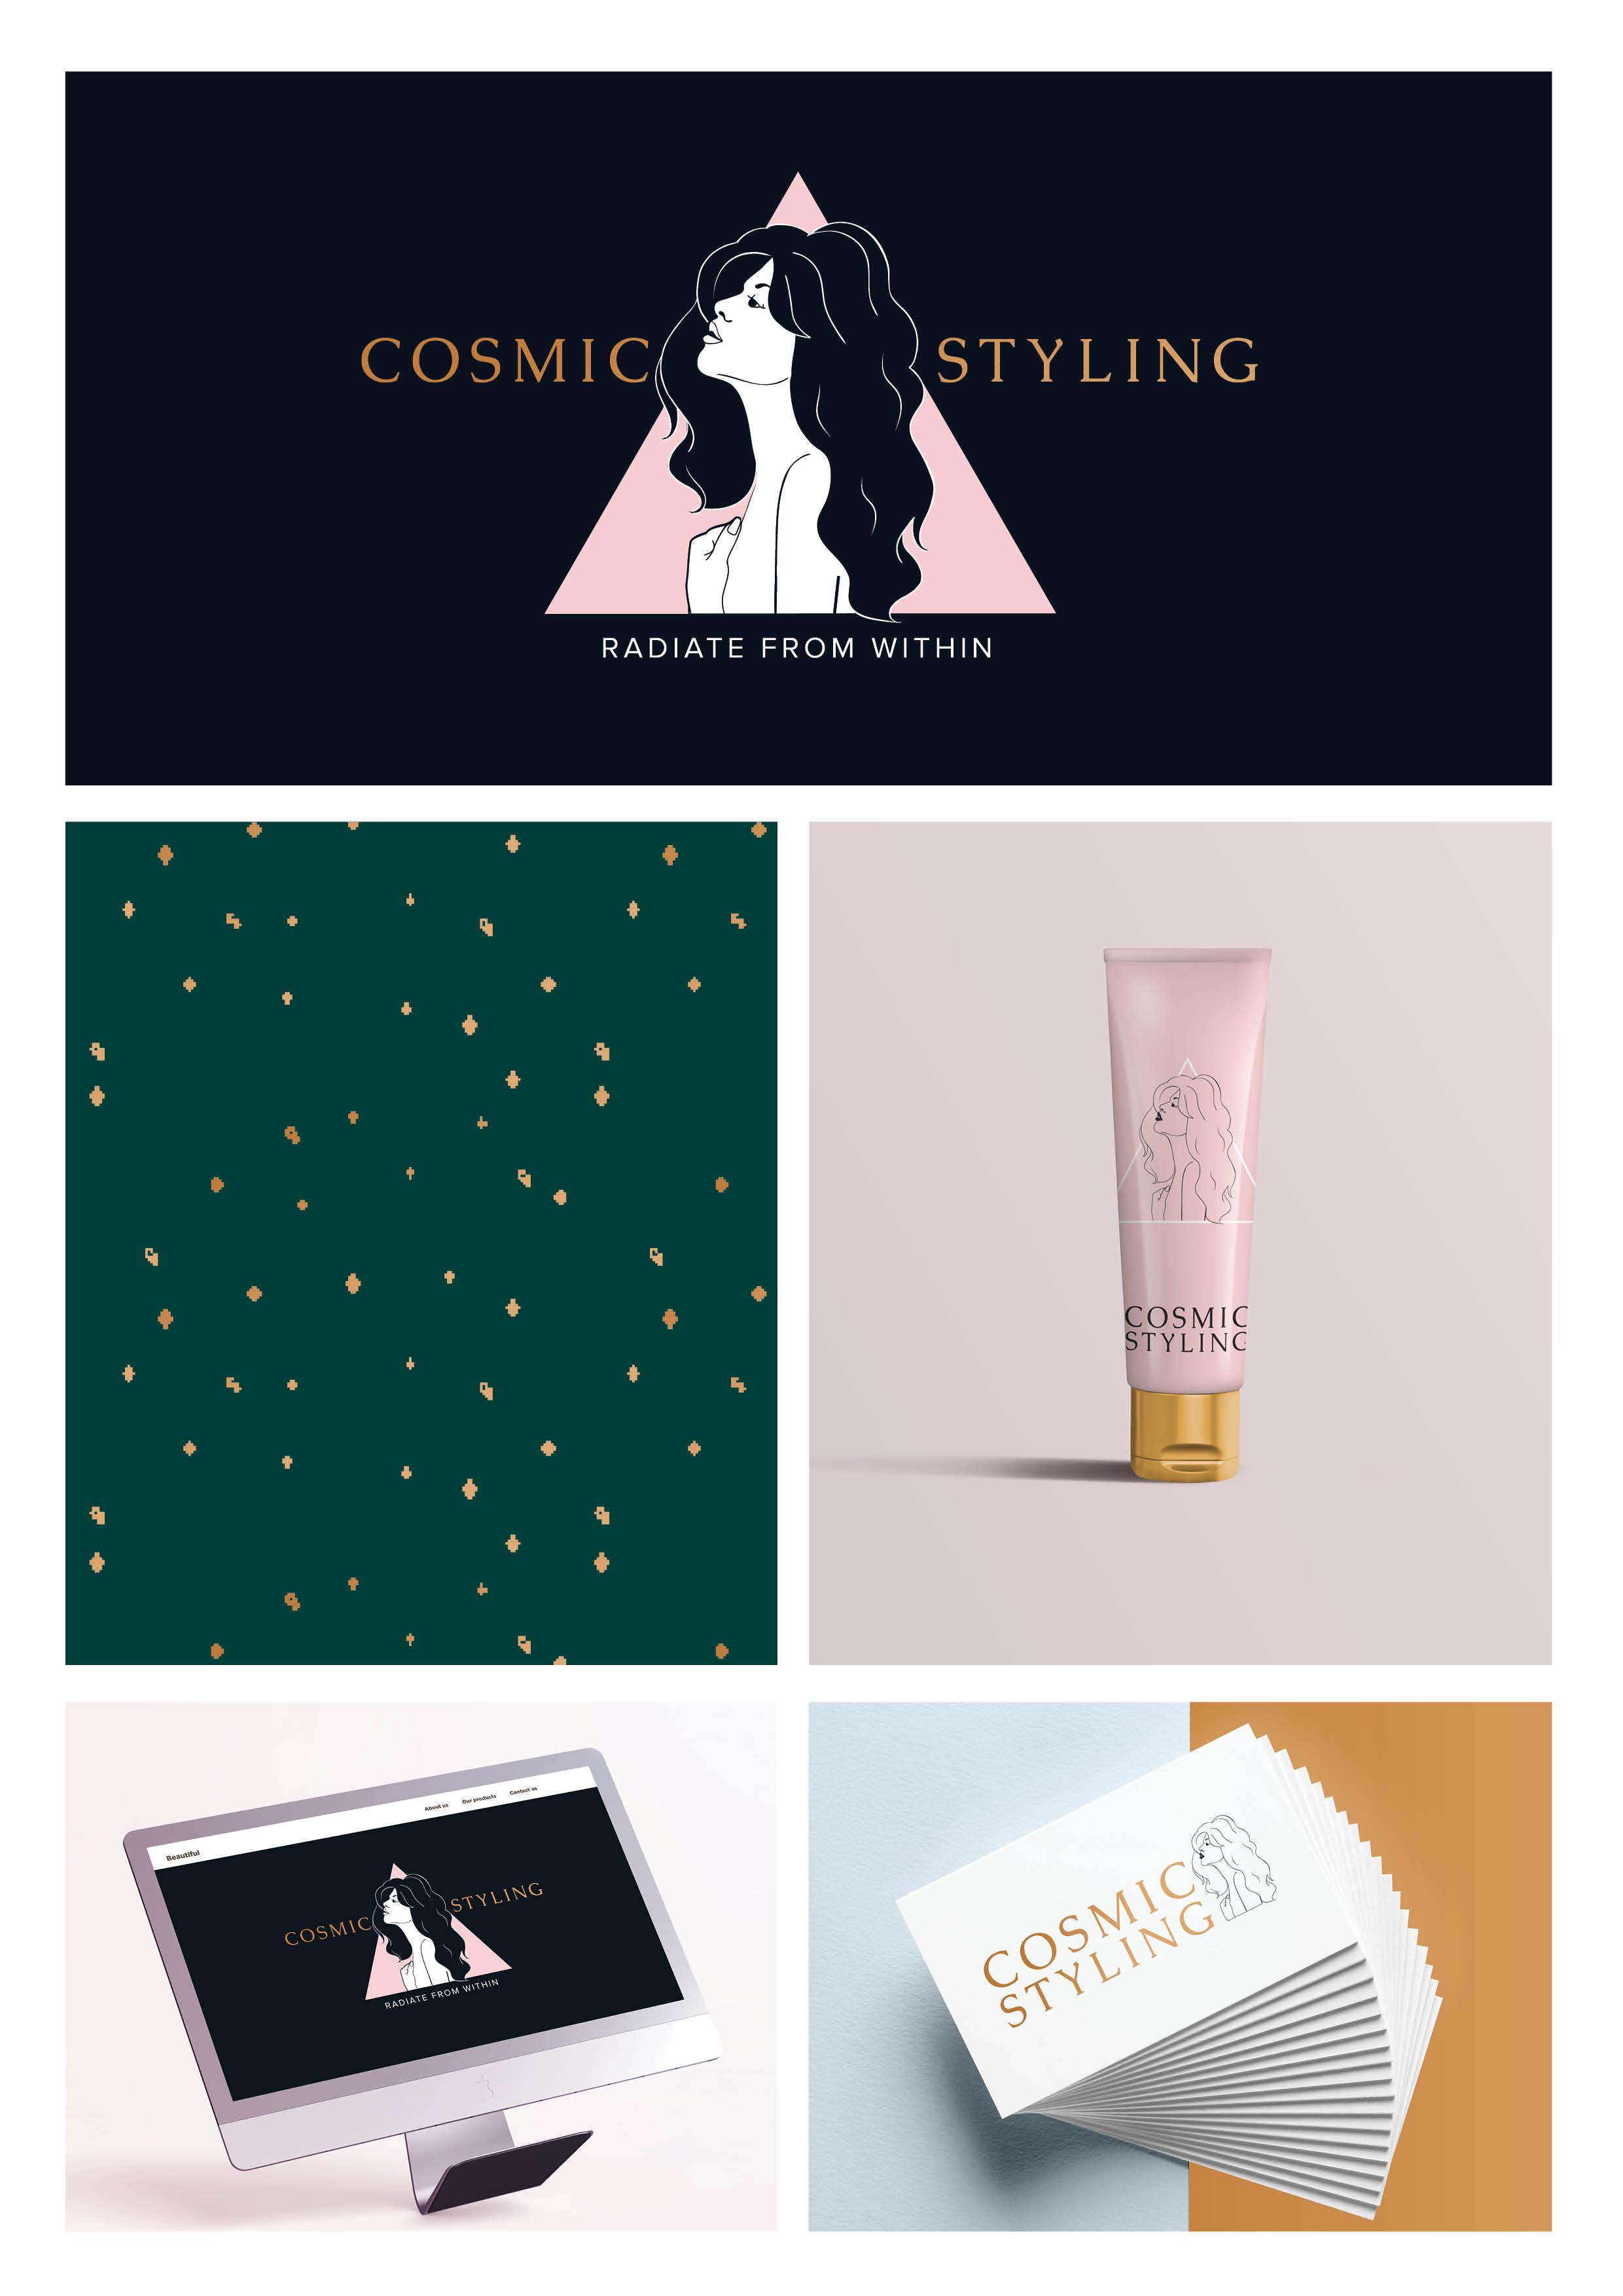 cosmic styling logo and brand deisign.jpg